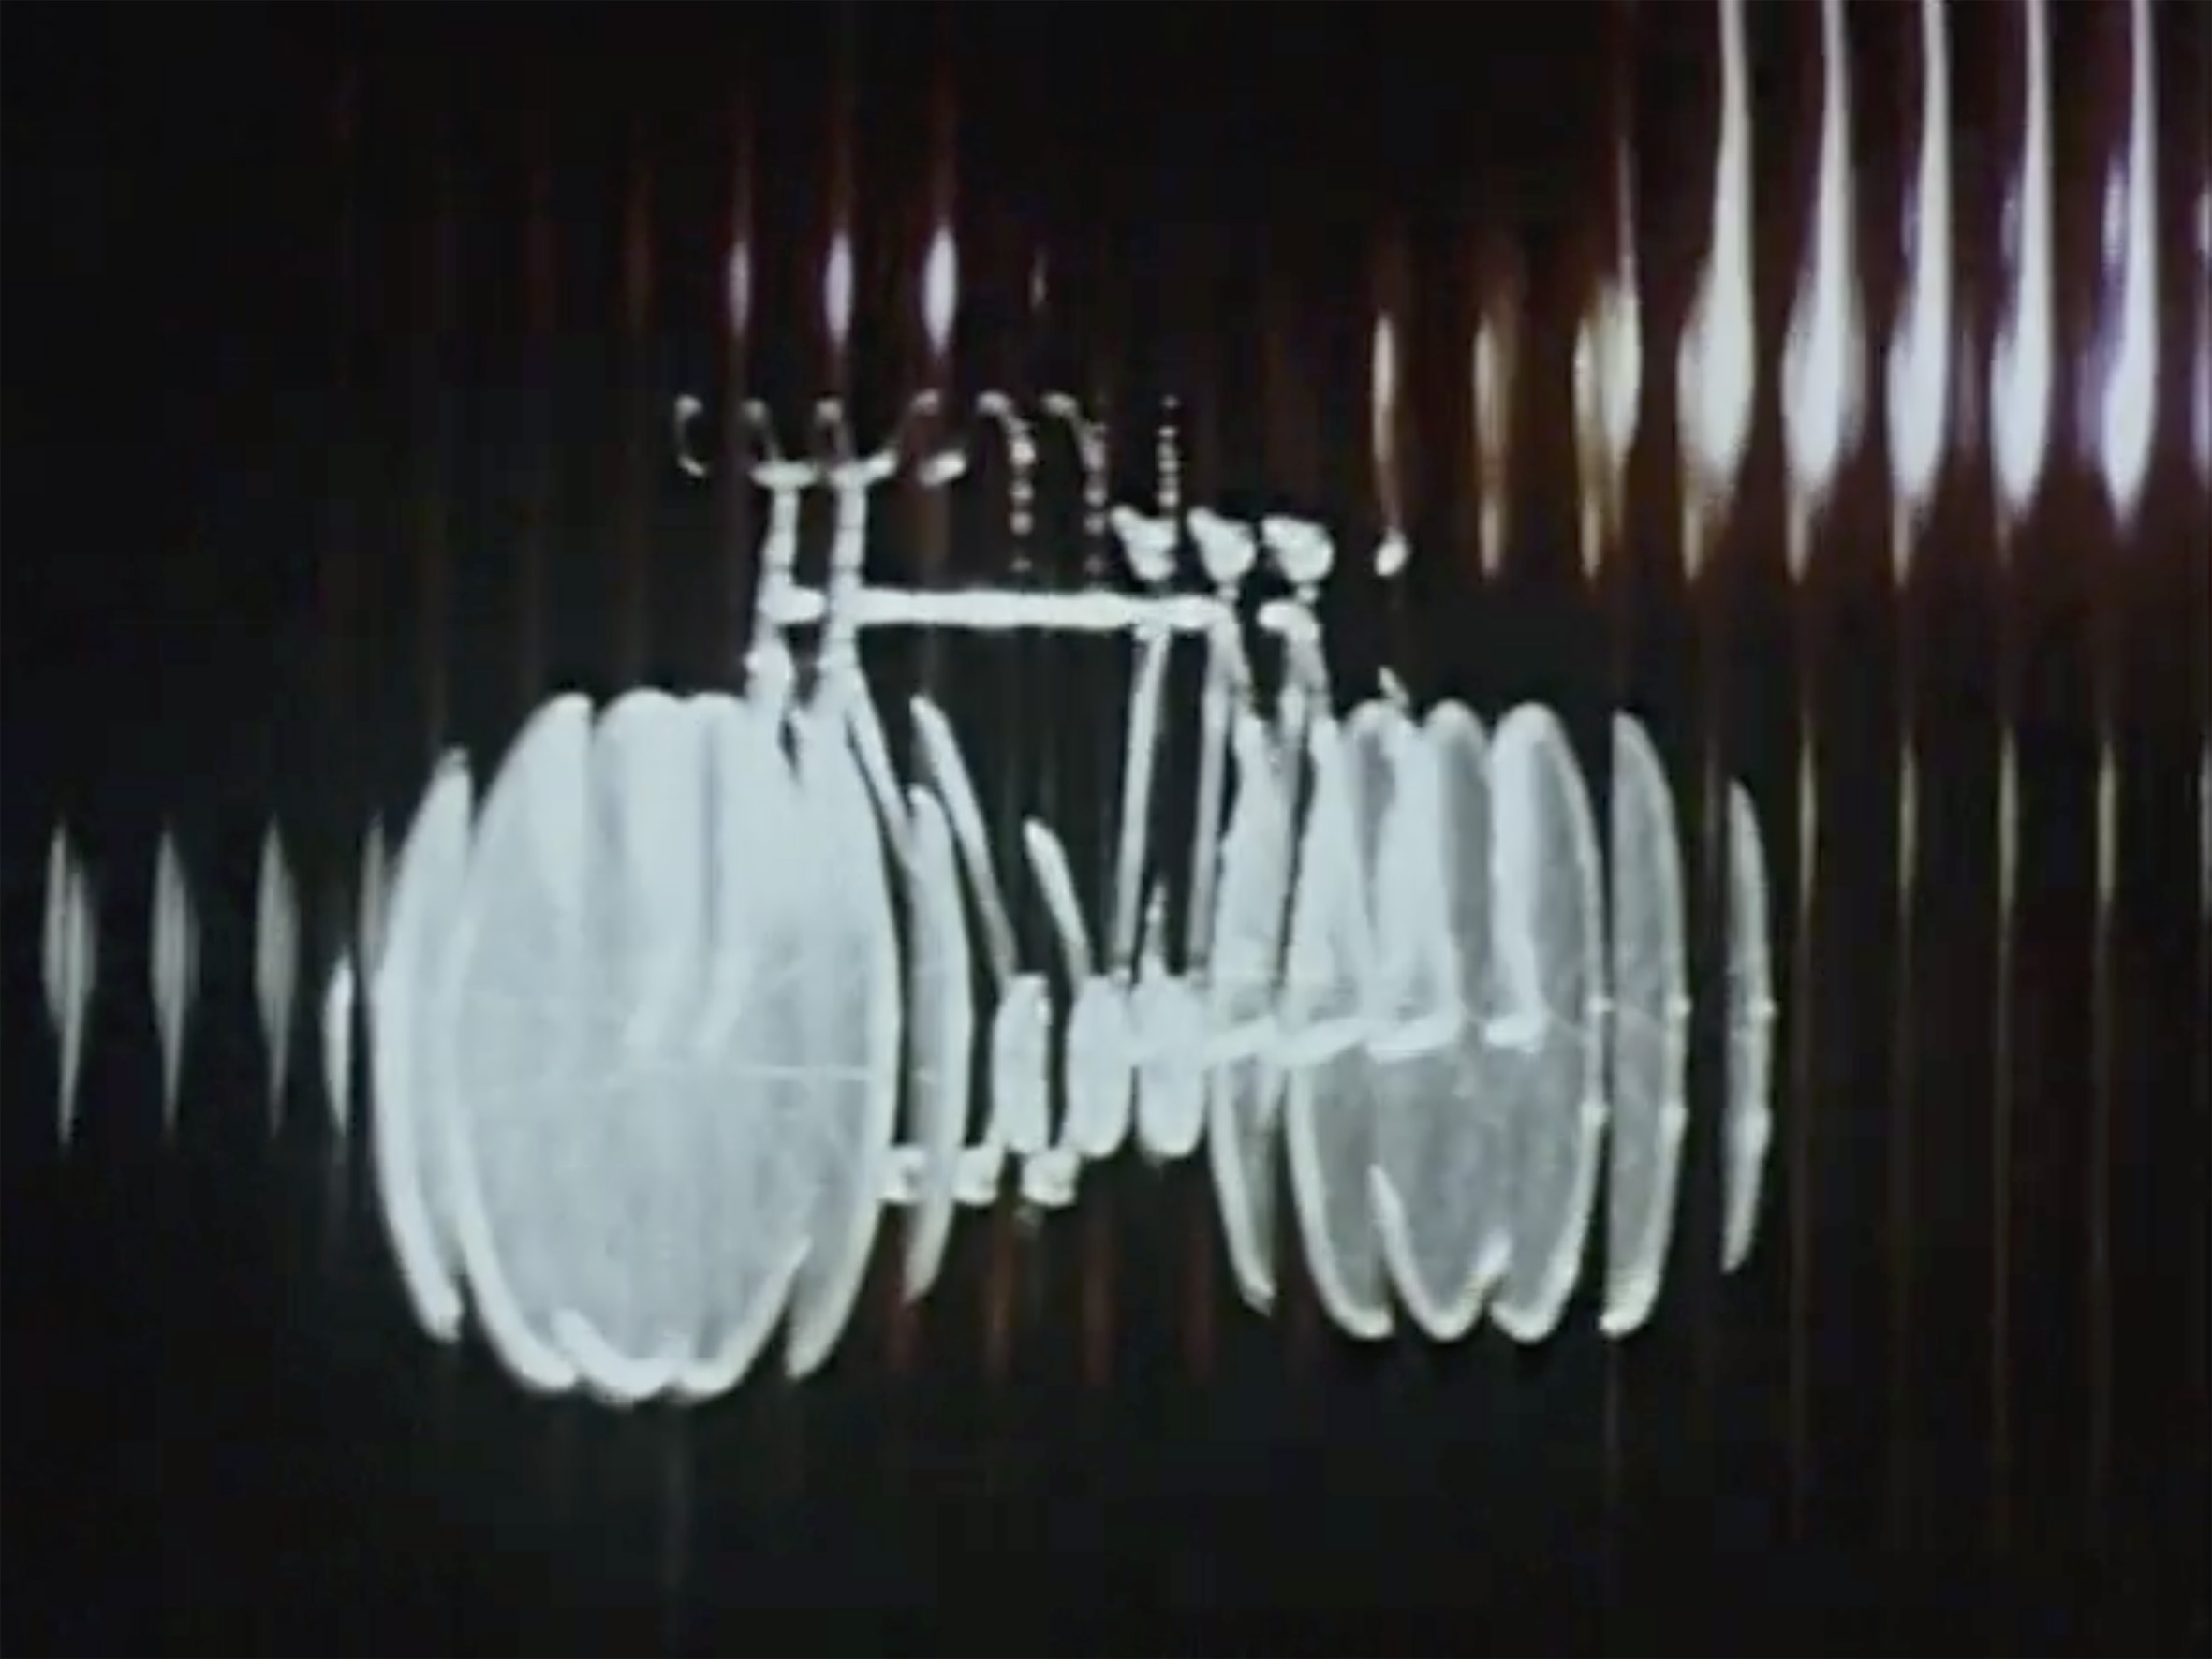 Ginrin, 1955, 35mm (銀輪)